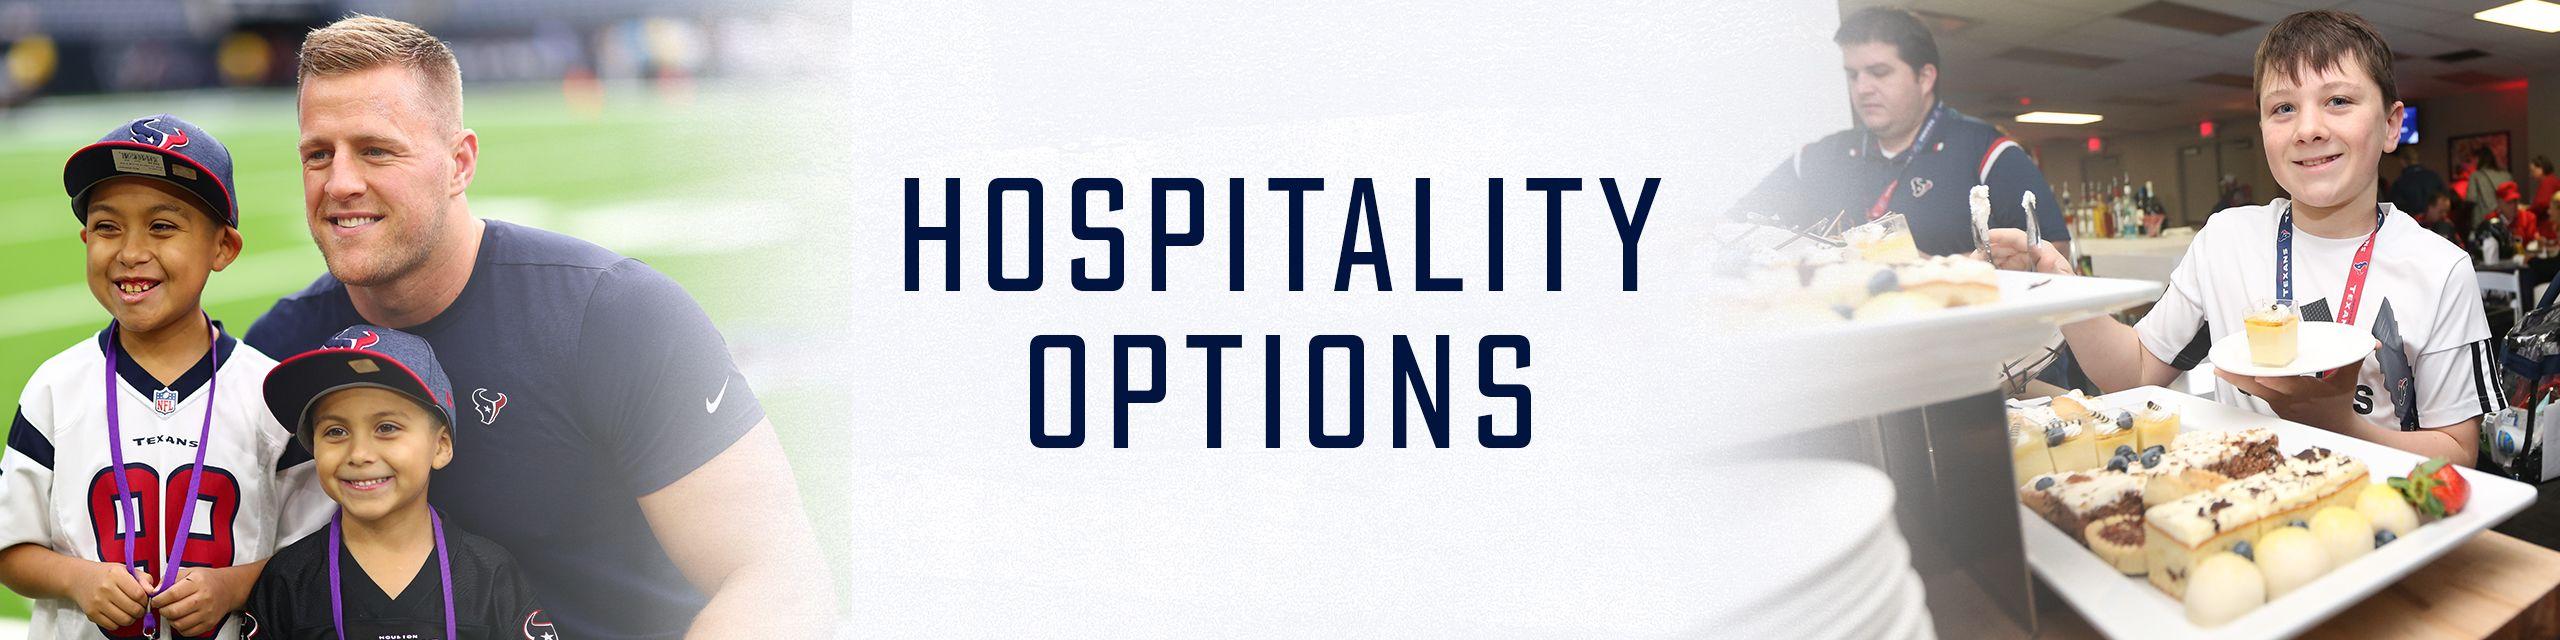 Hospitality Options